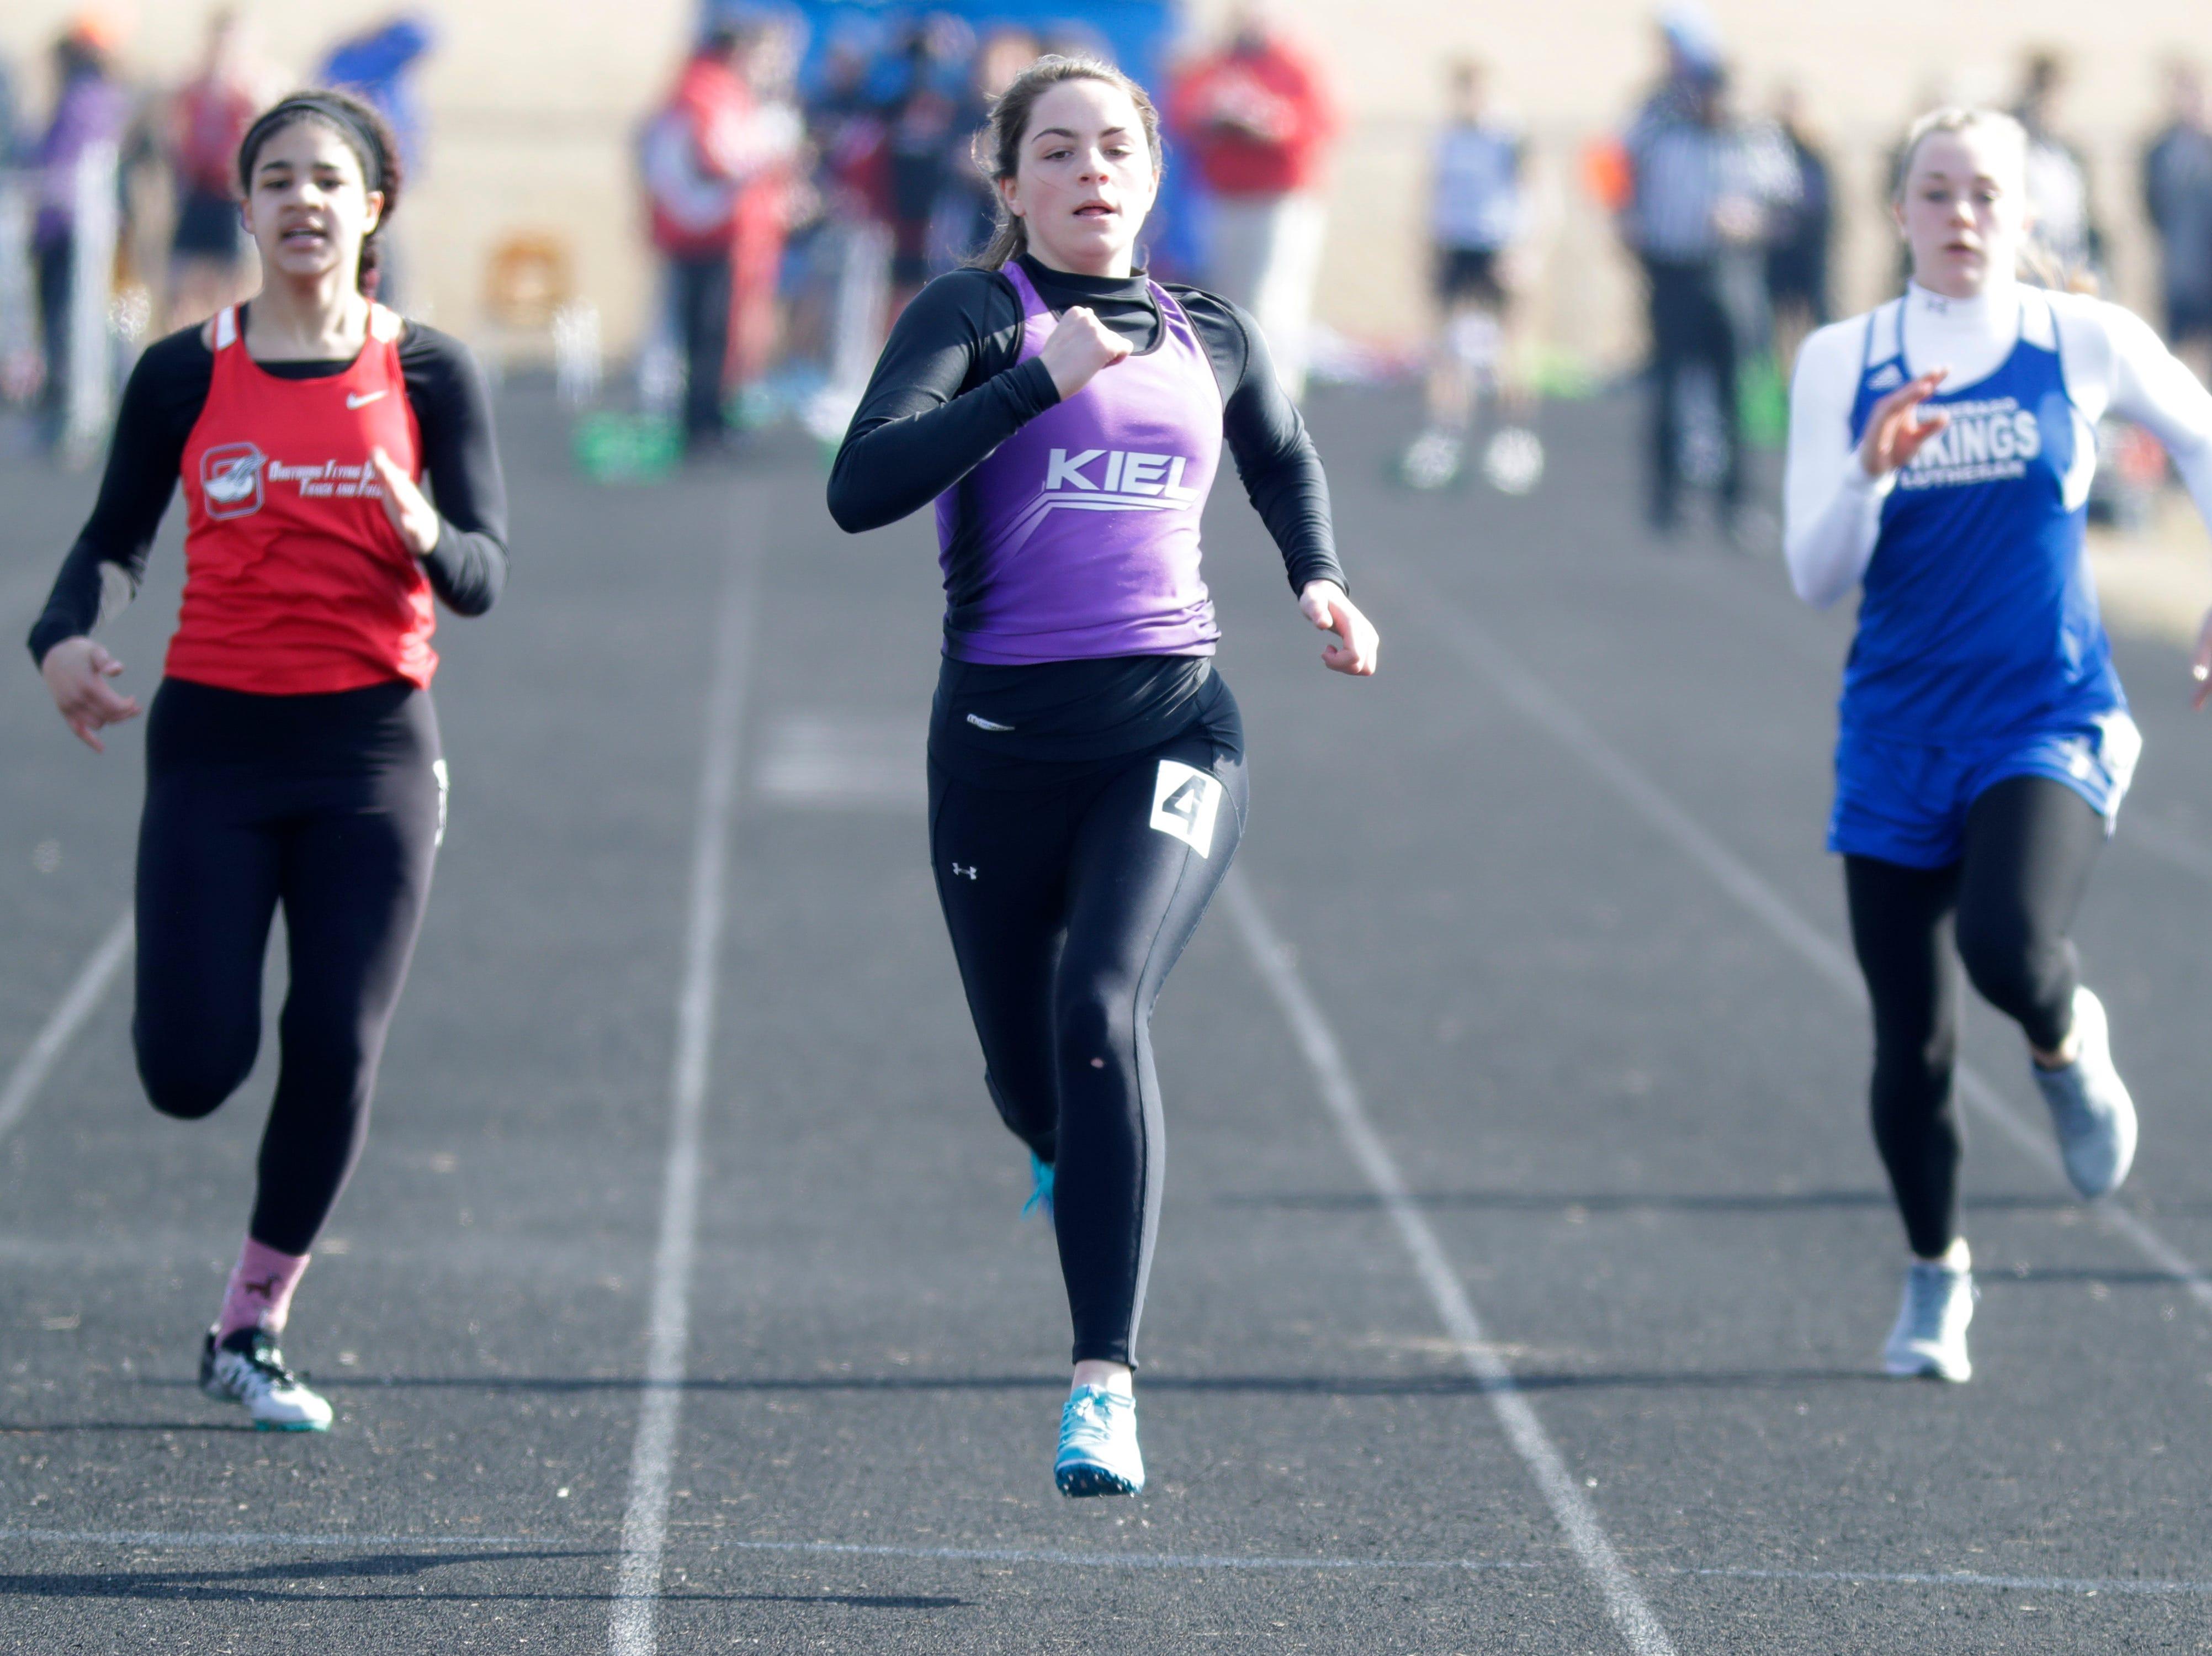 Oostburg's Monica Mentink, left, Kiel's Holly Vogel, center, and Winnebago Lutheran's Peyton Kemnitz compete in the 100 meter dash, Friday, April 5, 2019, in Oostburg, Wis.